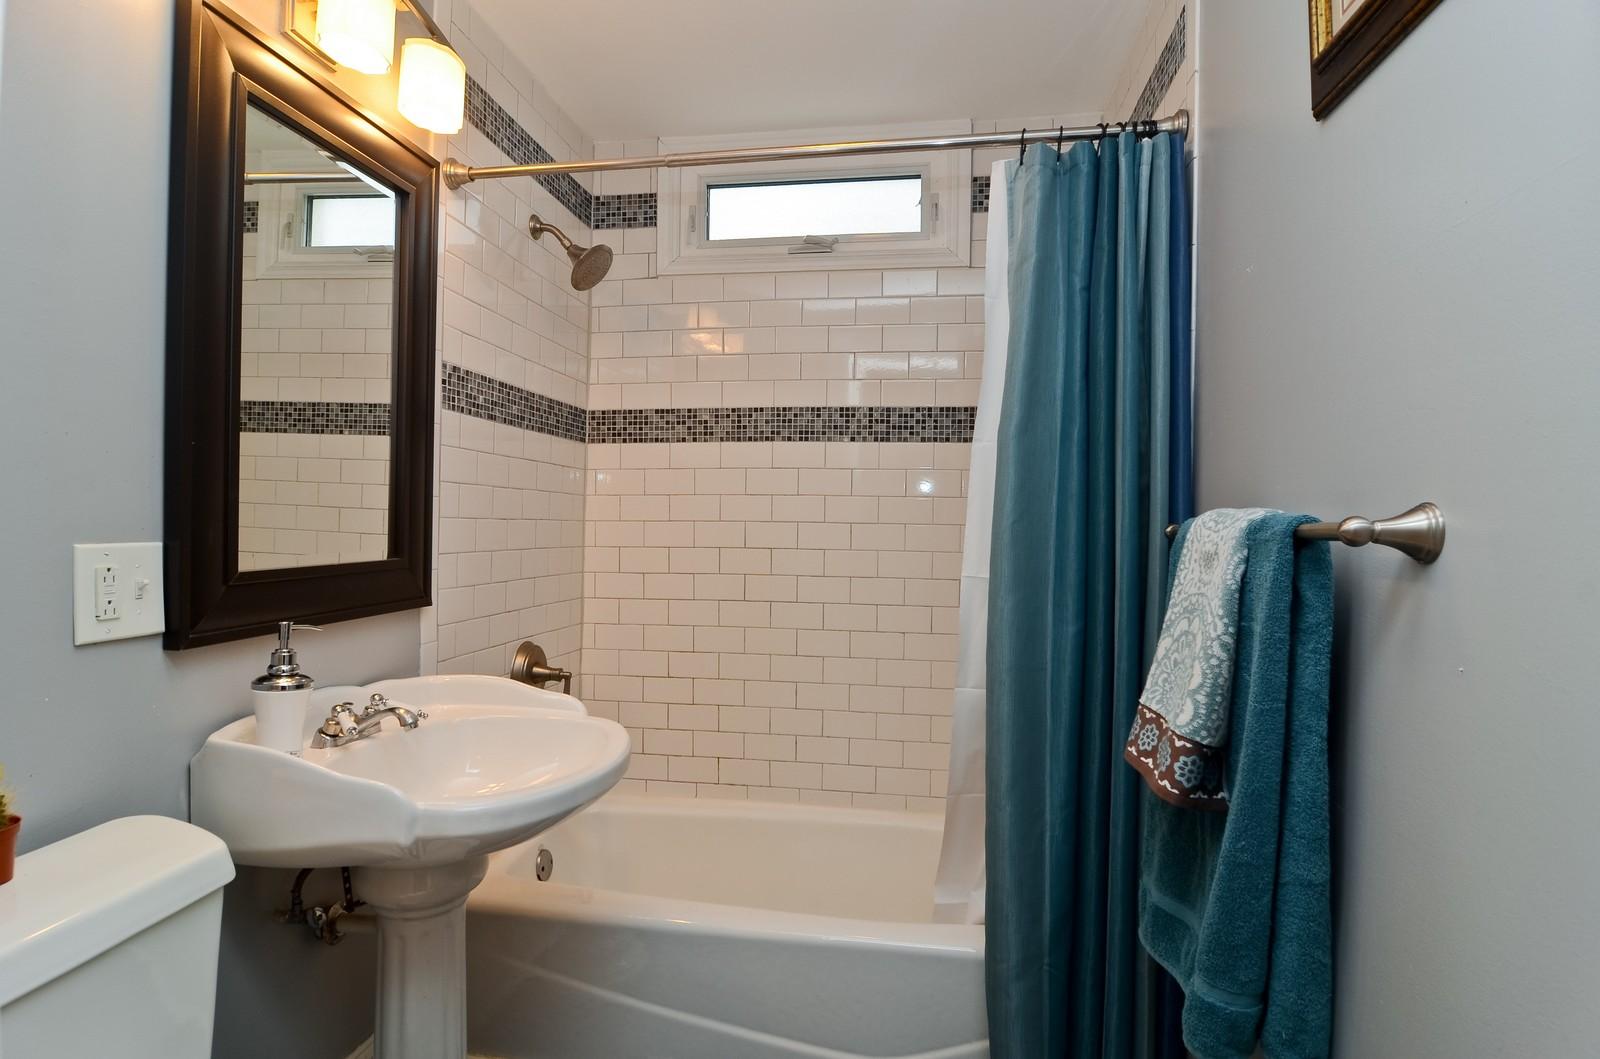 Real Estate Photography - 3525 W Wollfram, Chicago, IL, 60618 - Bathroom